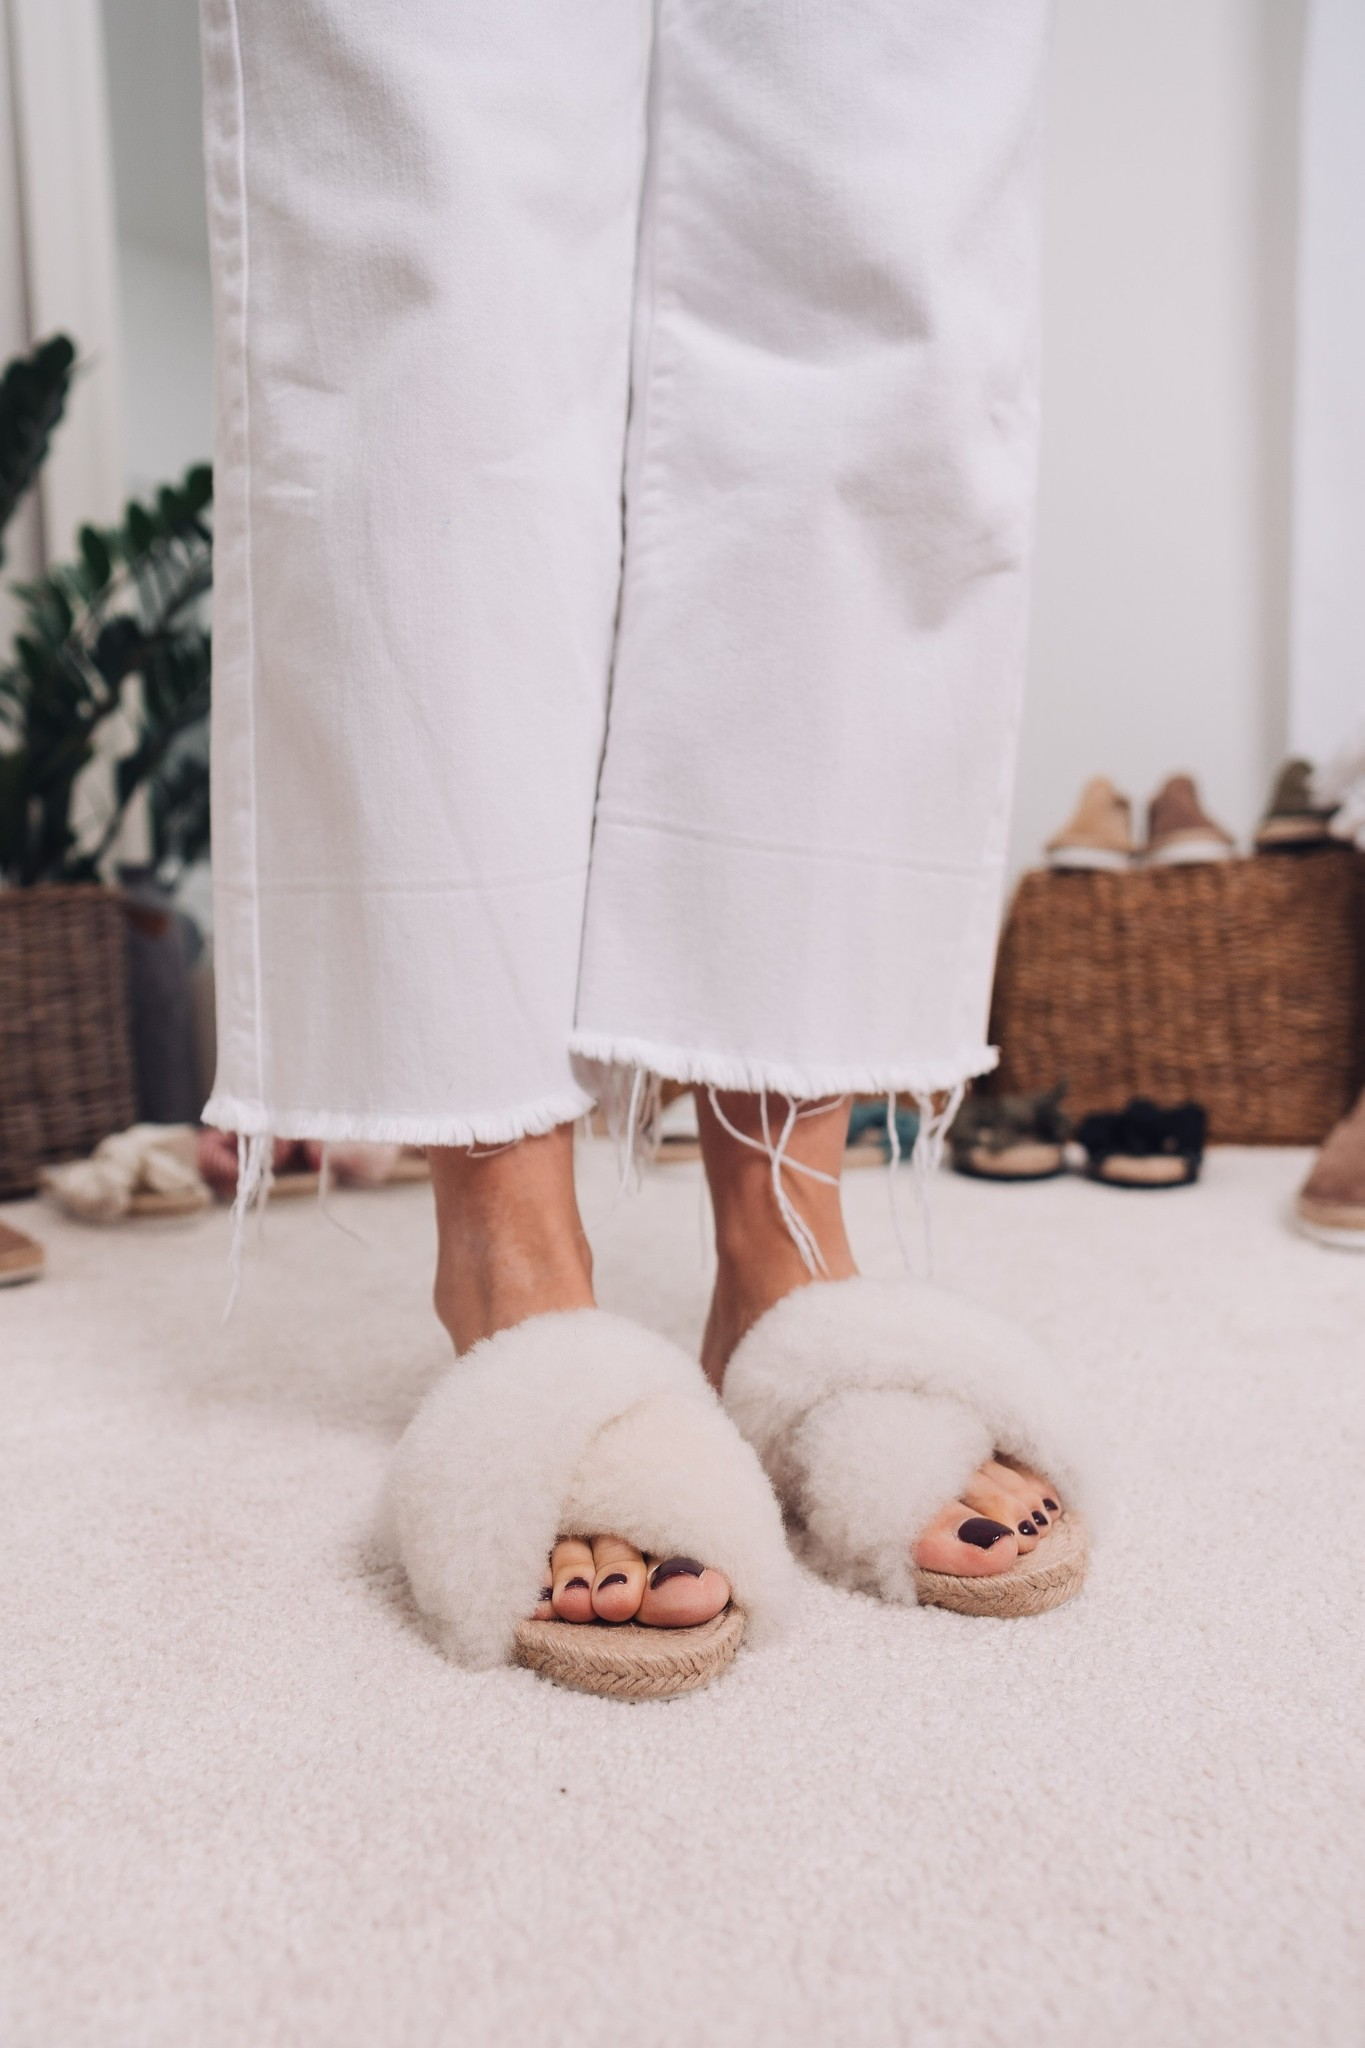 Lori Sheepskin Wool Slippers - Off White-5